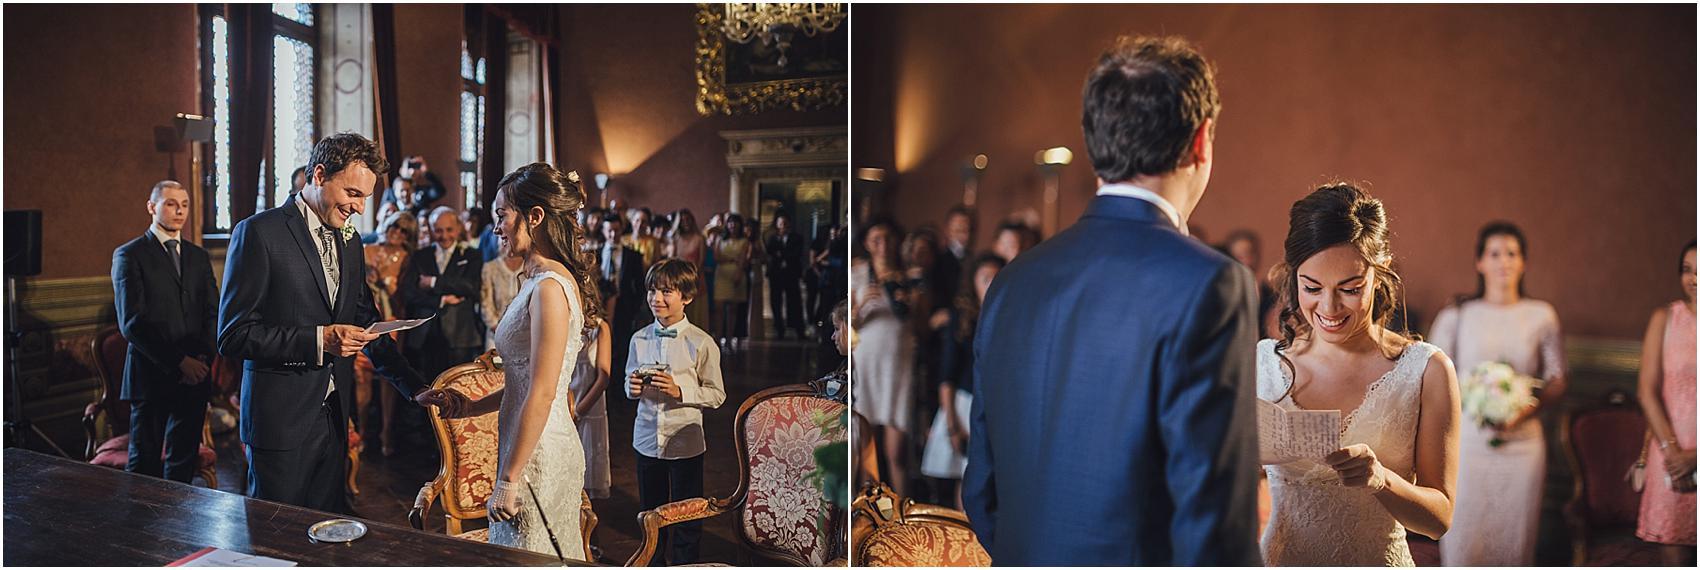 destination-wedding-photographer-tuscany_0163